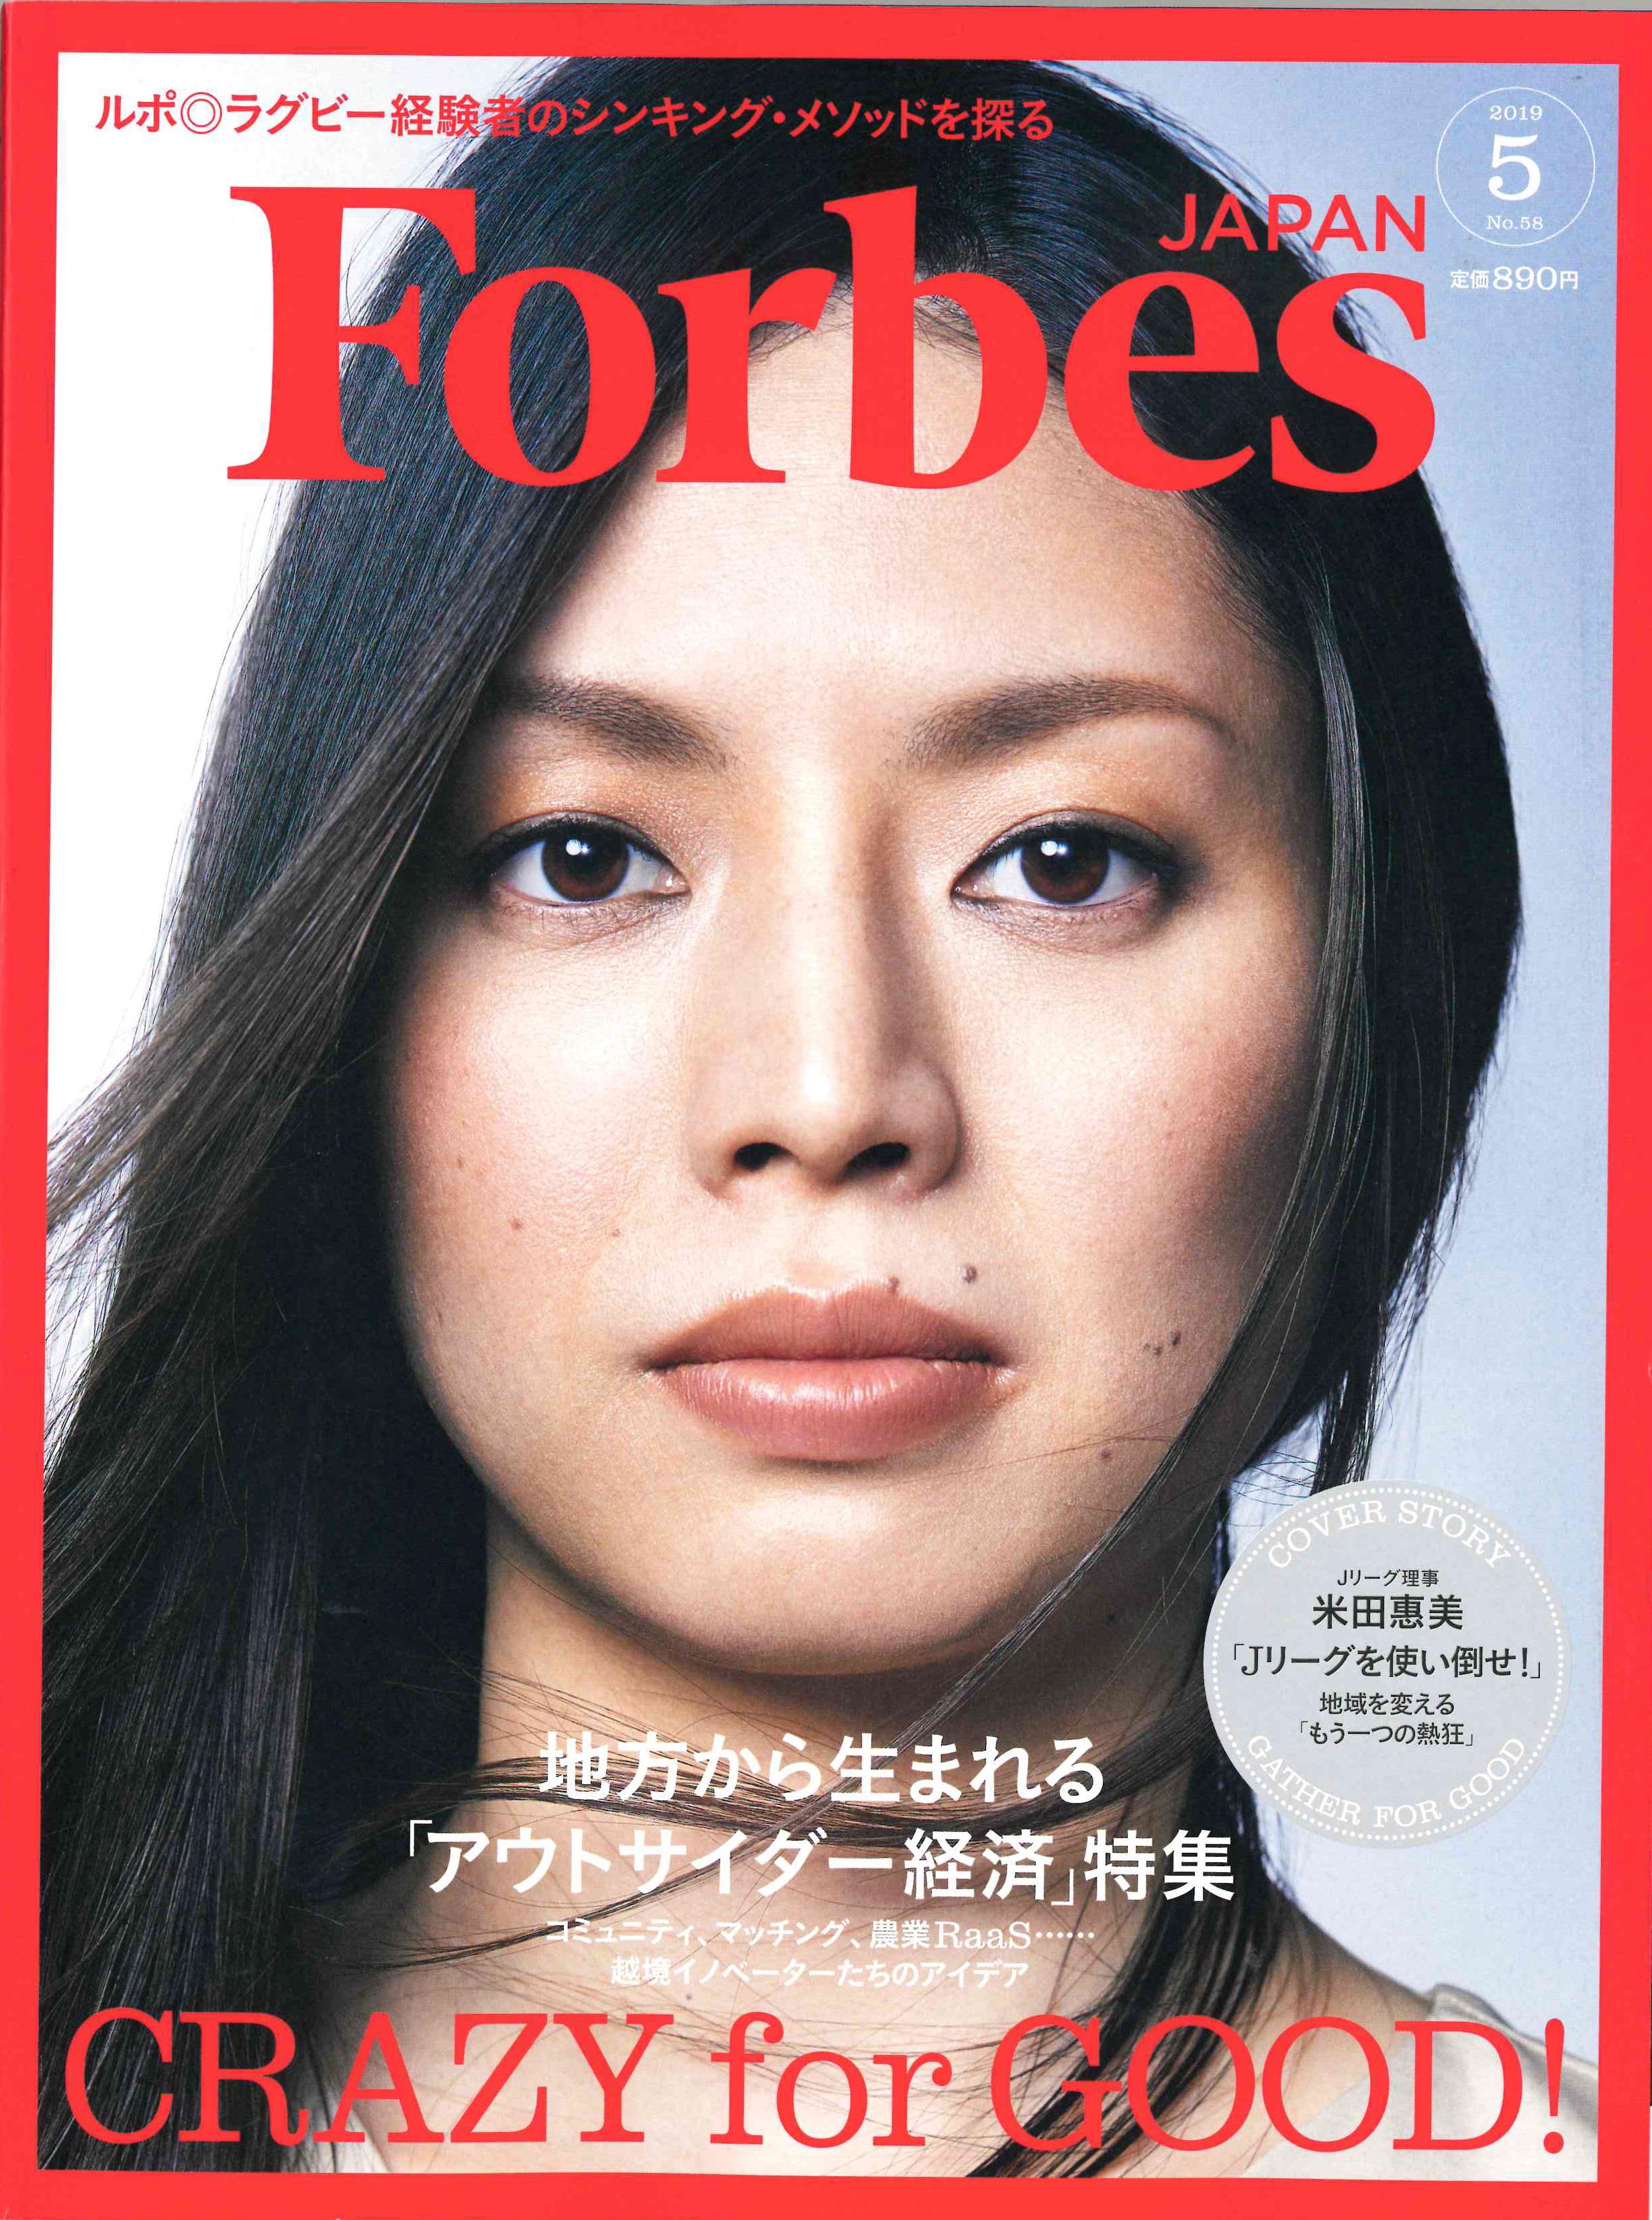 3月25日発売「Forbes JAPAN 5月号」表紙